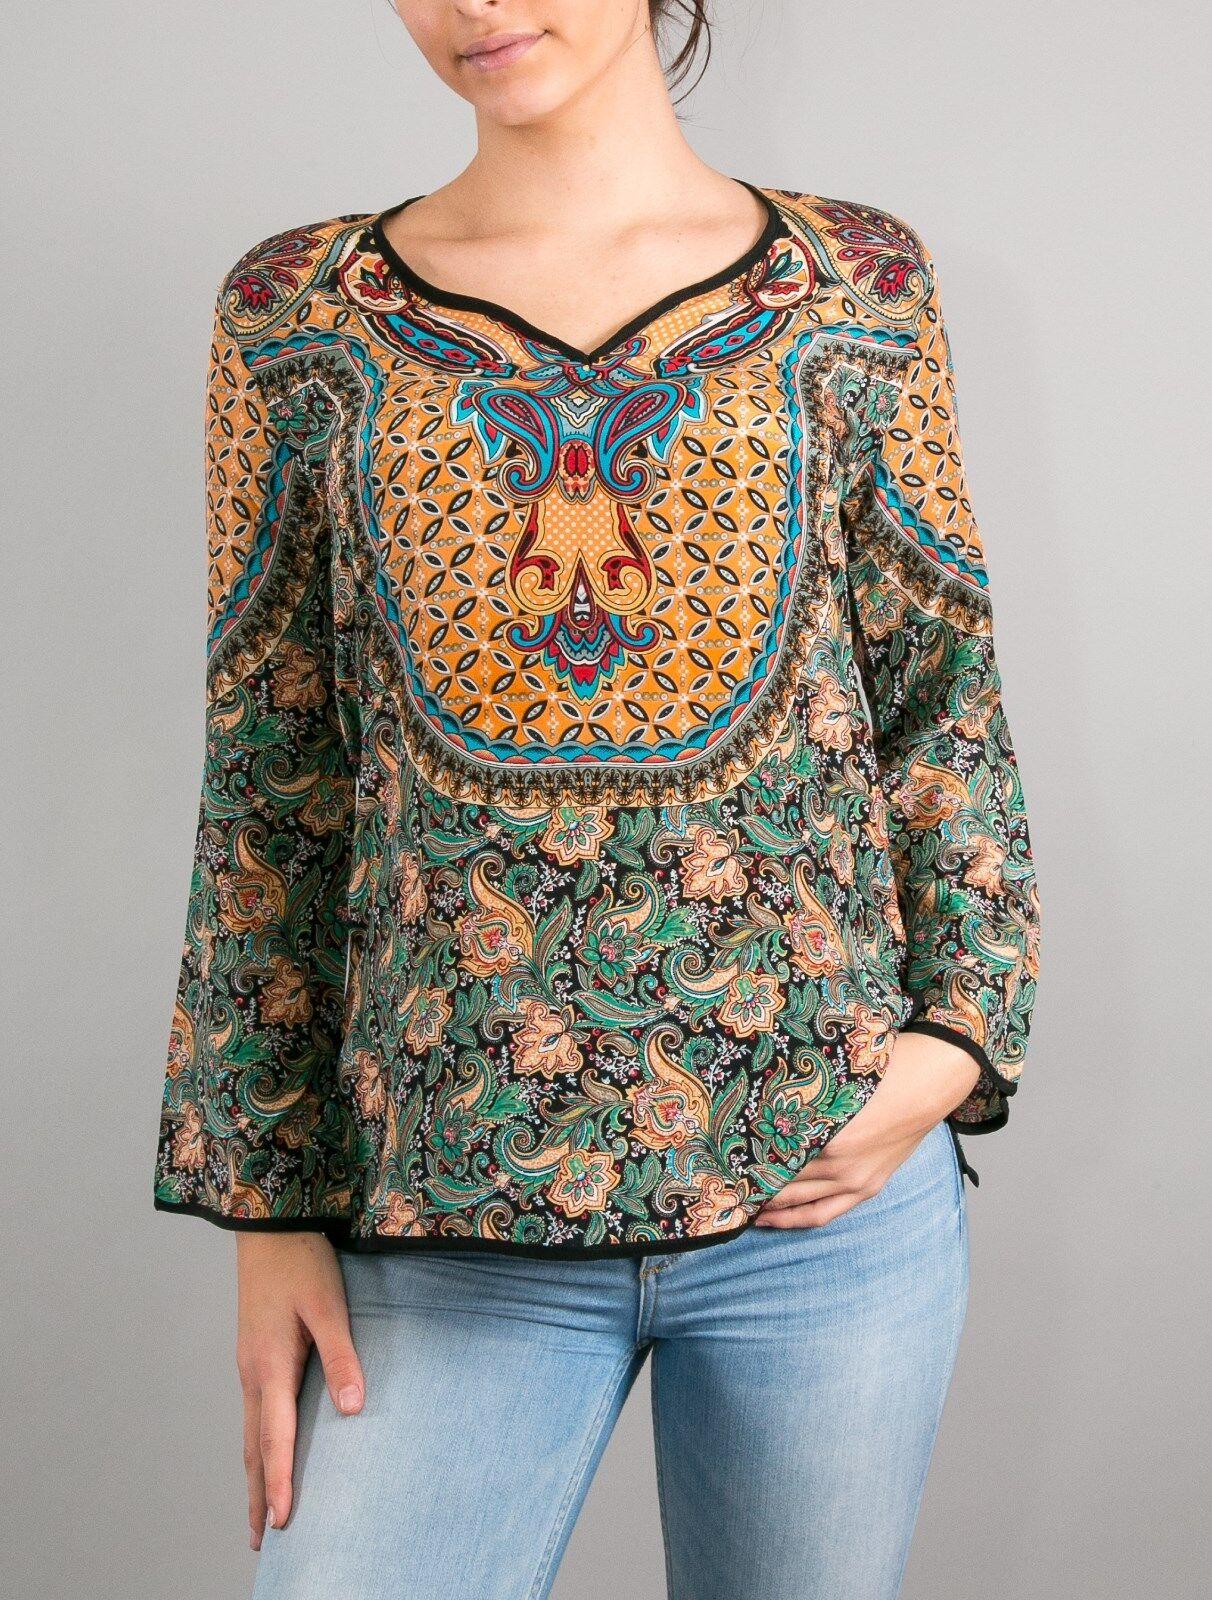 Tolani Womens Salina Topk Turquoise - Shirts & Tops